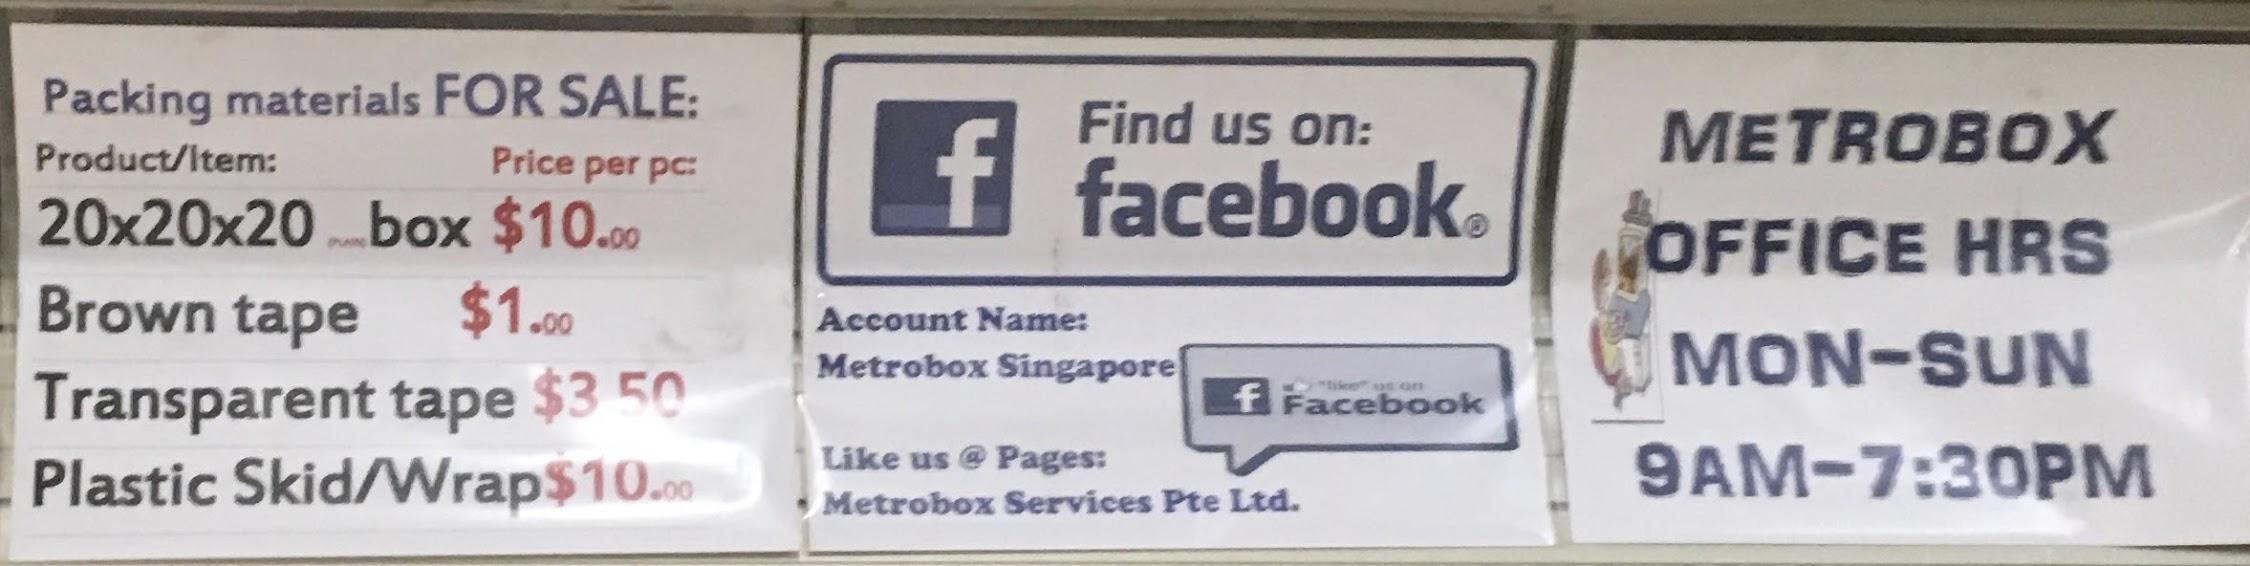 metrobox